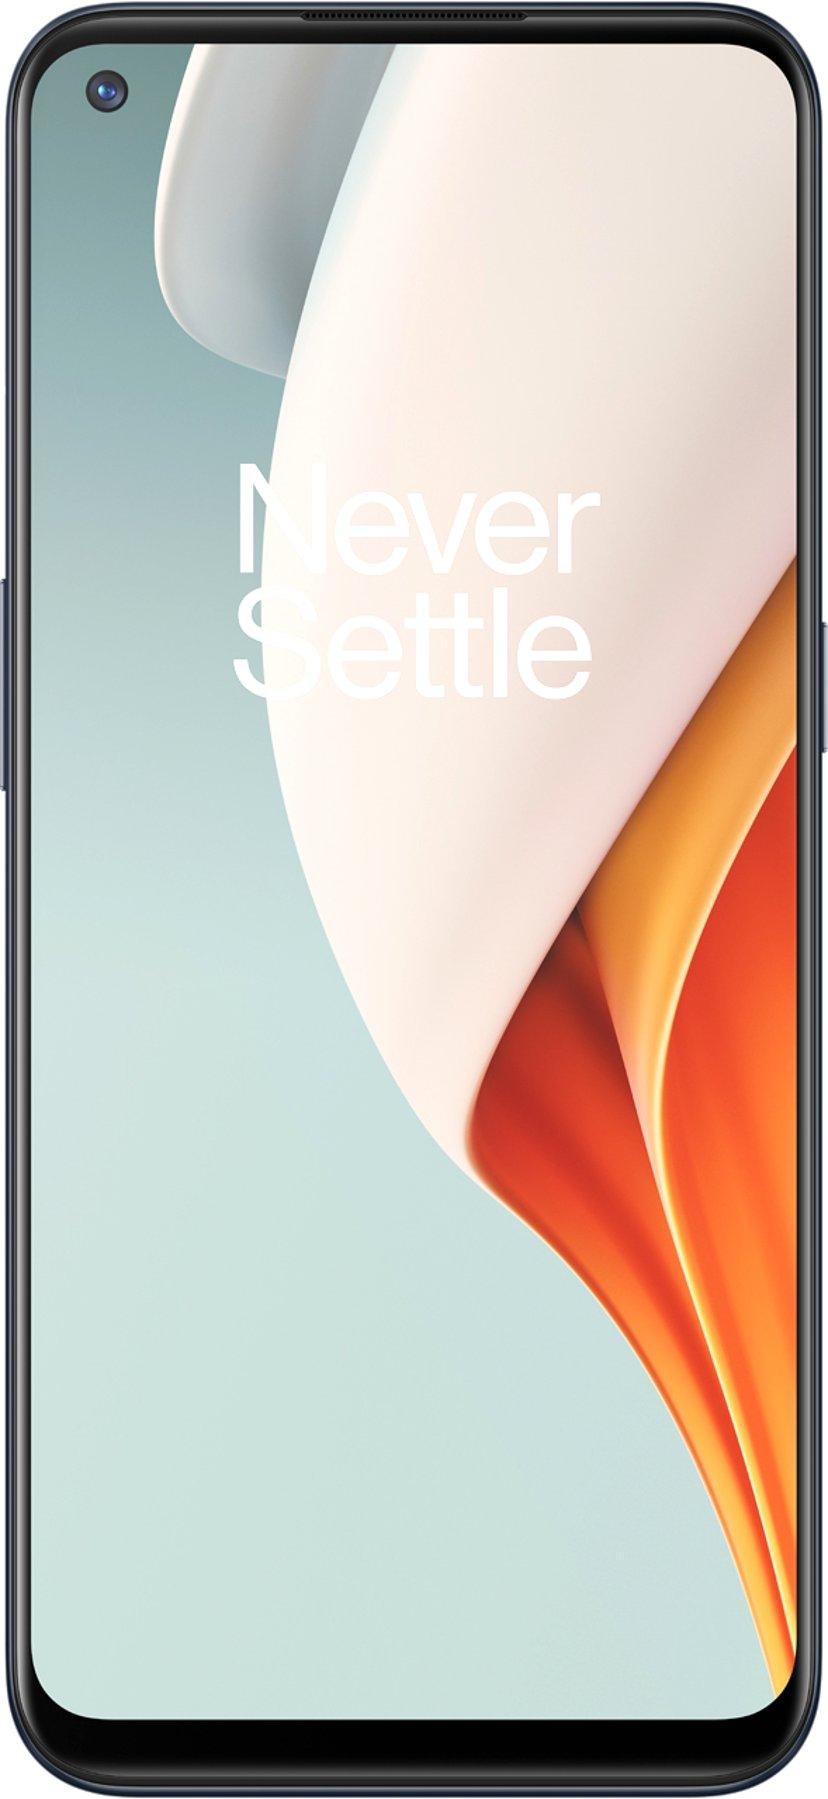 OnePlus Nord N100 64GB Kaksois-SIM Keskiyönpakkanen